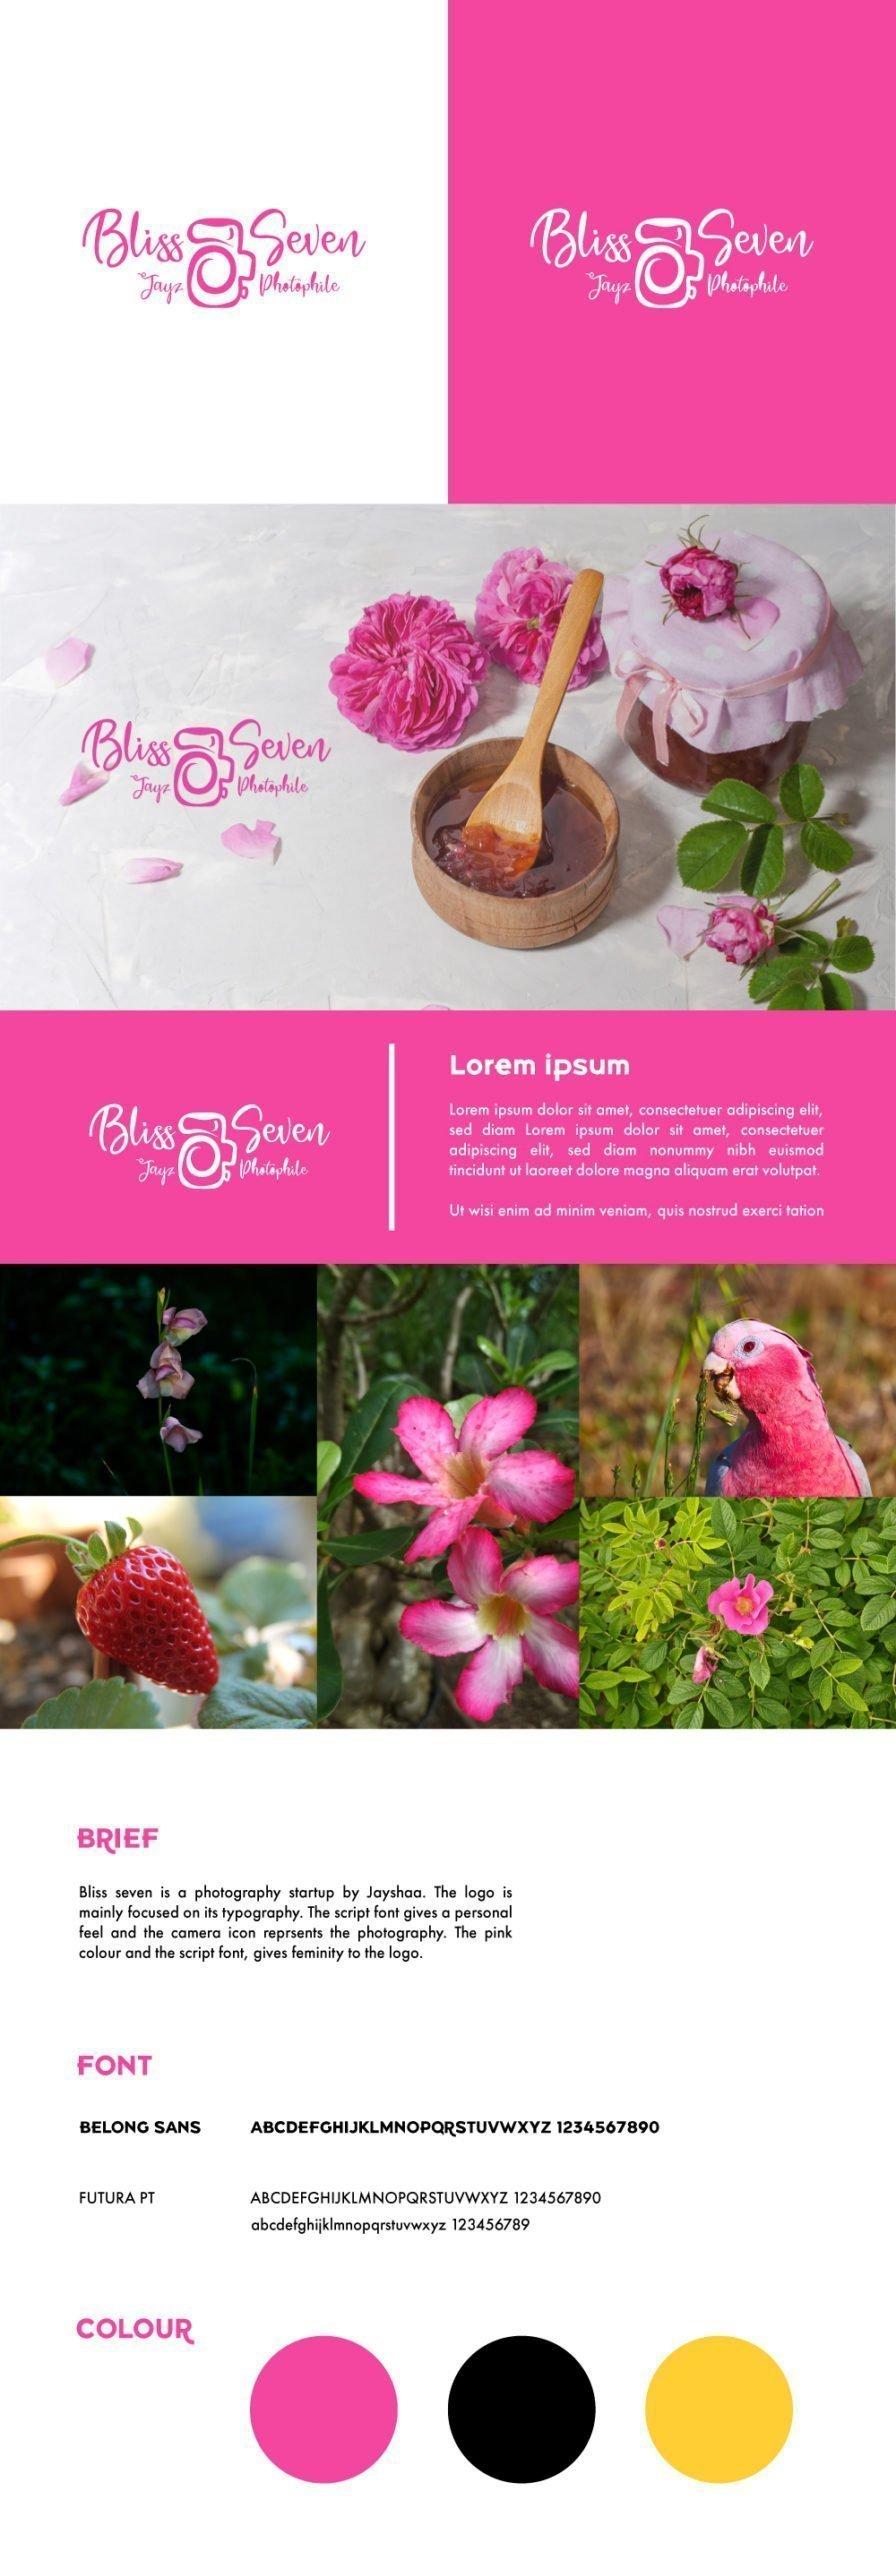 Bliss Seven Presentation scaled | Logo designer in Coimbatore